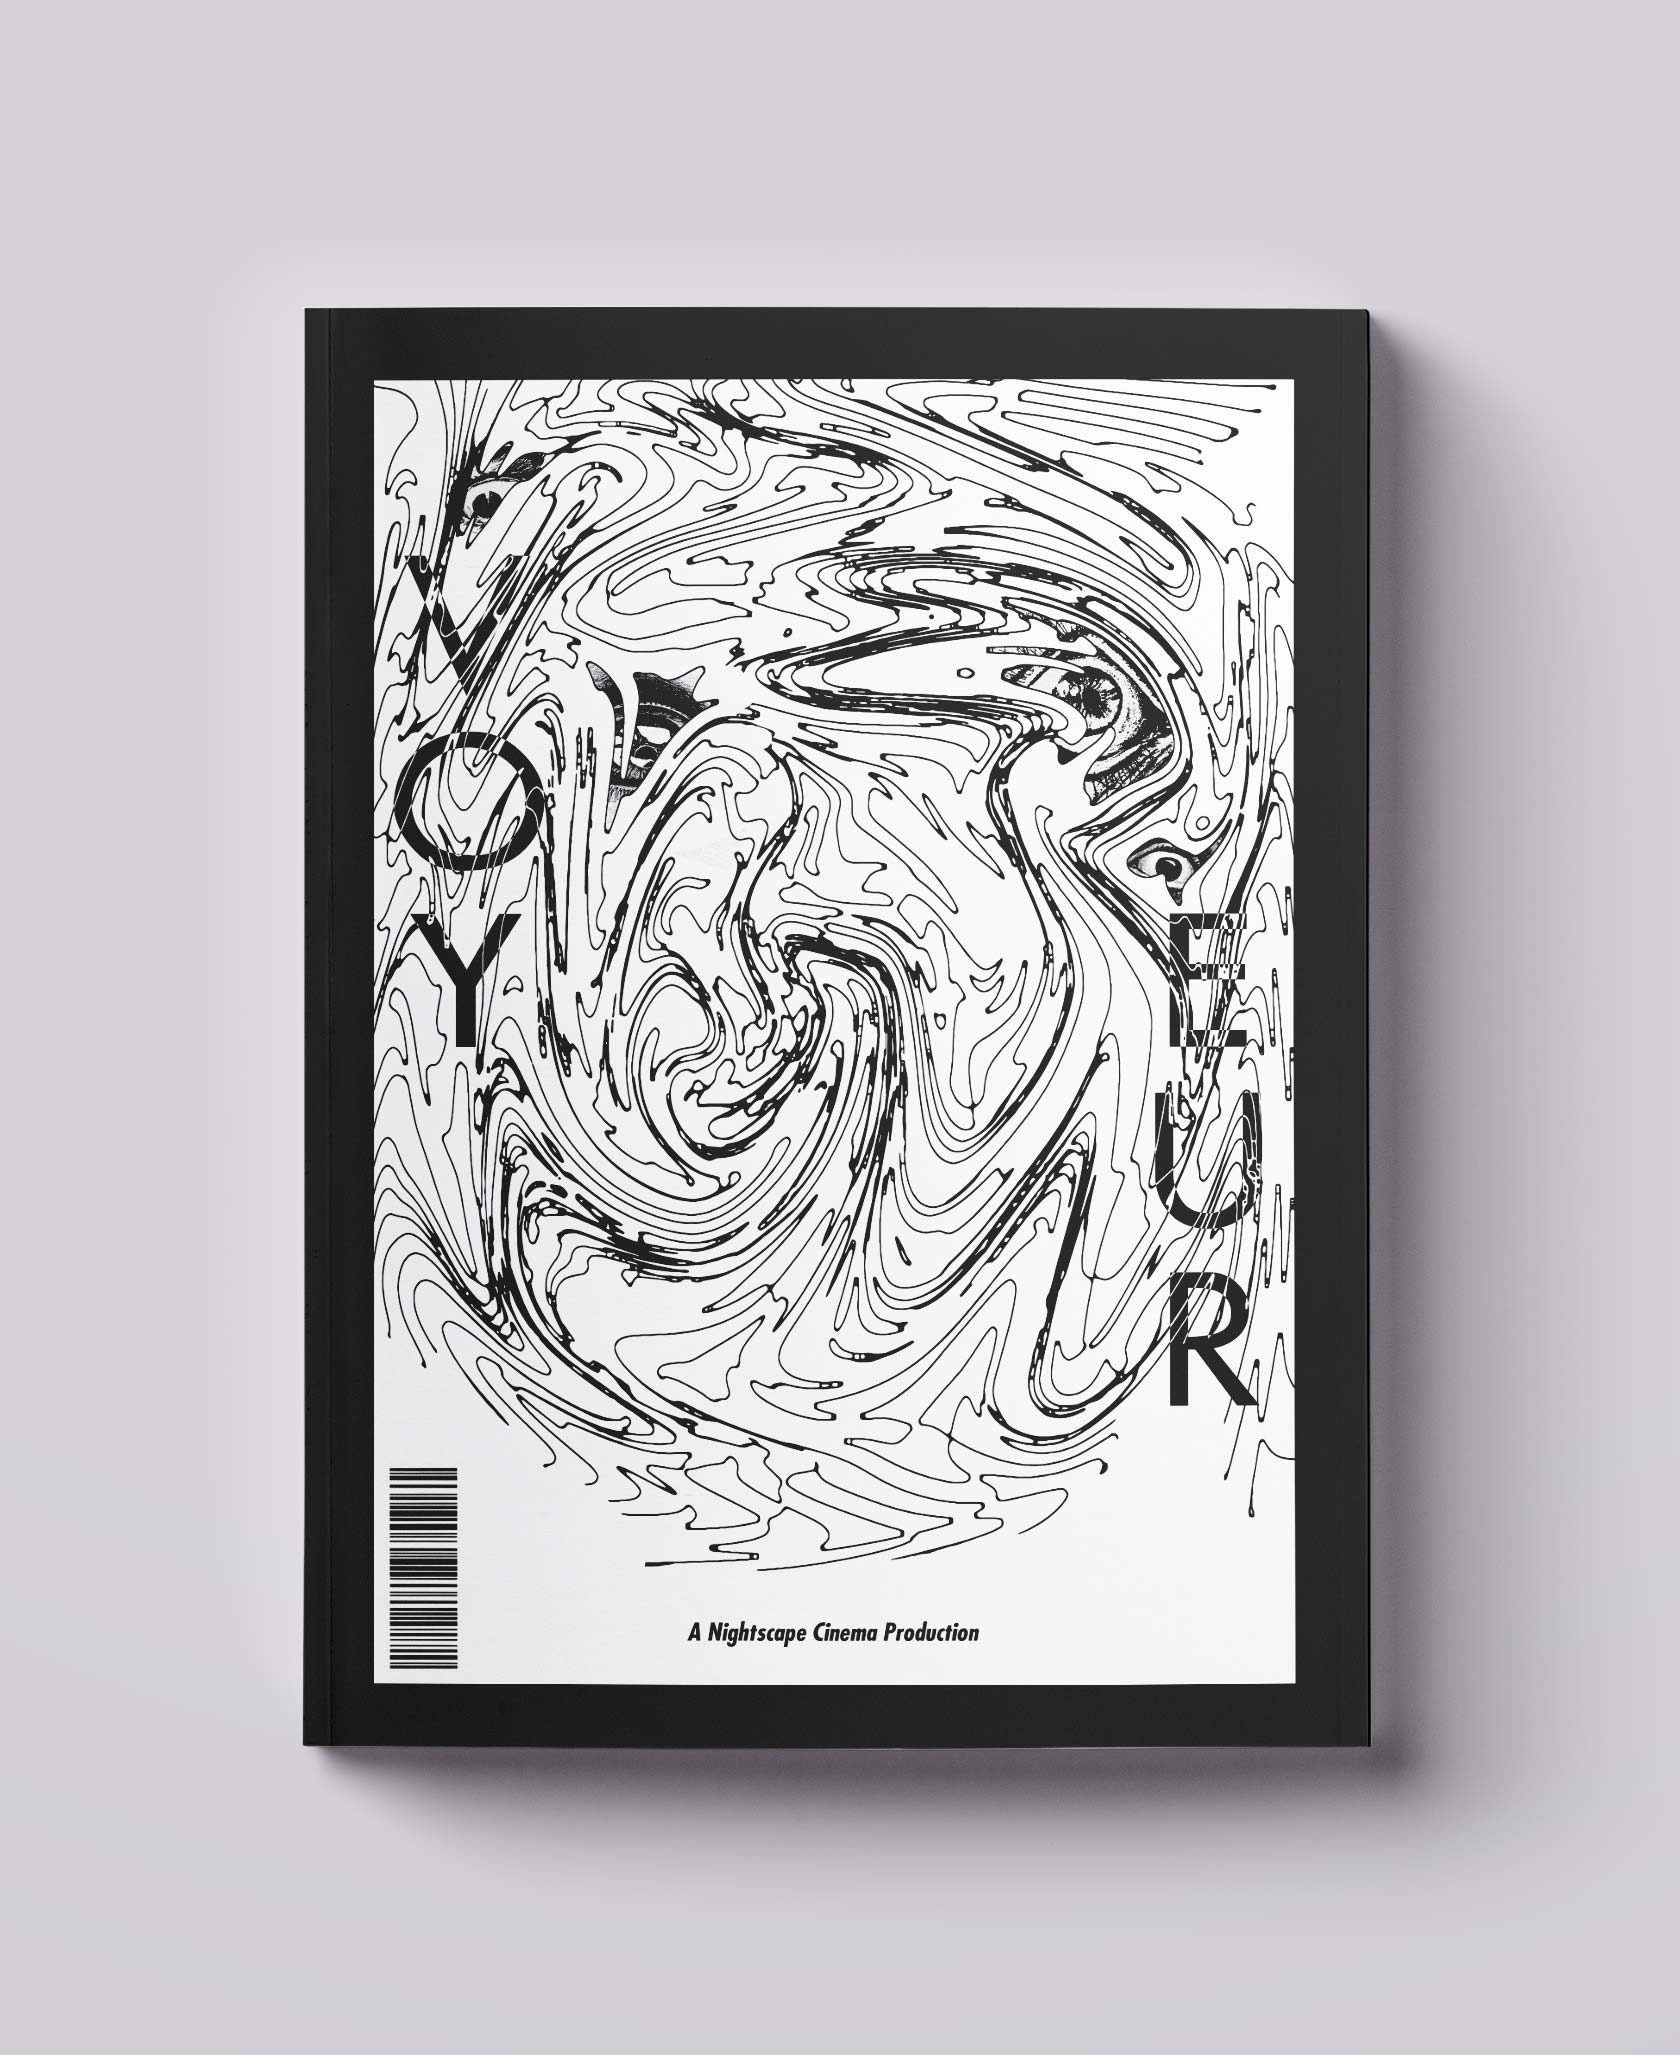 Voyeur Film Magazine Cover Design by Furia